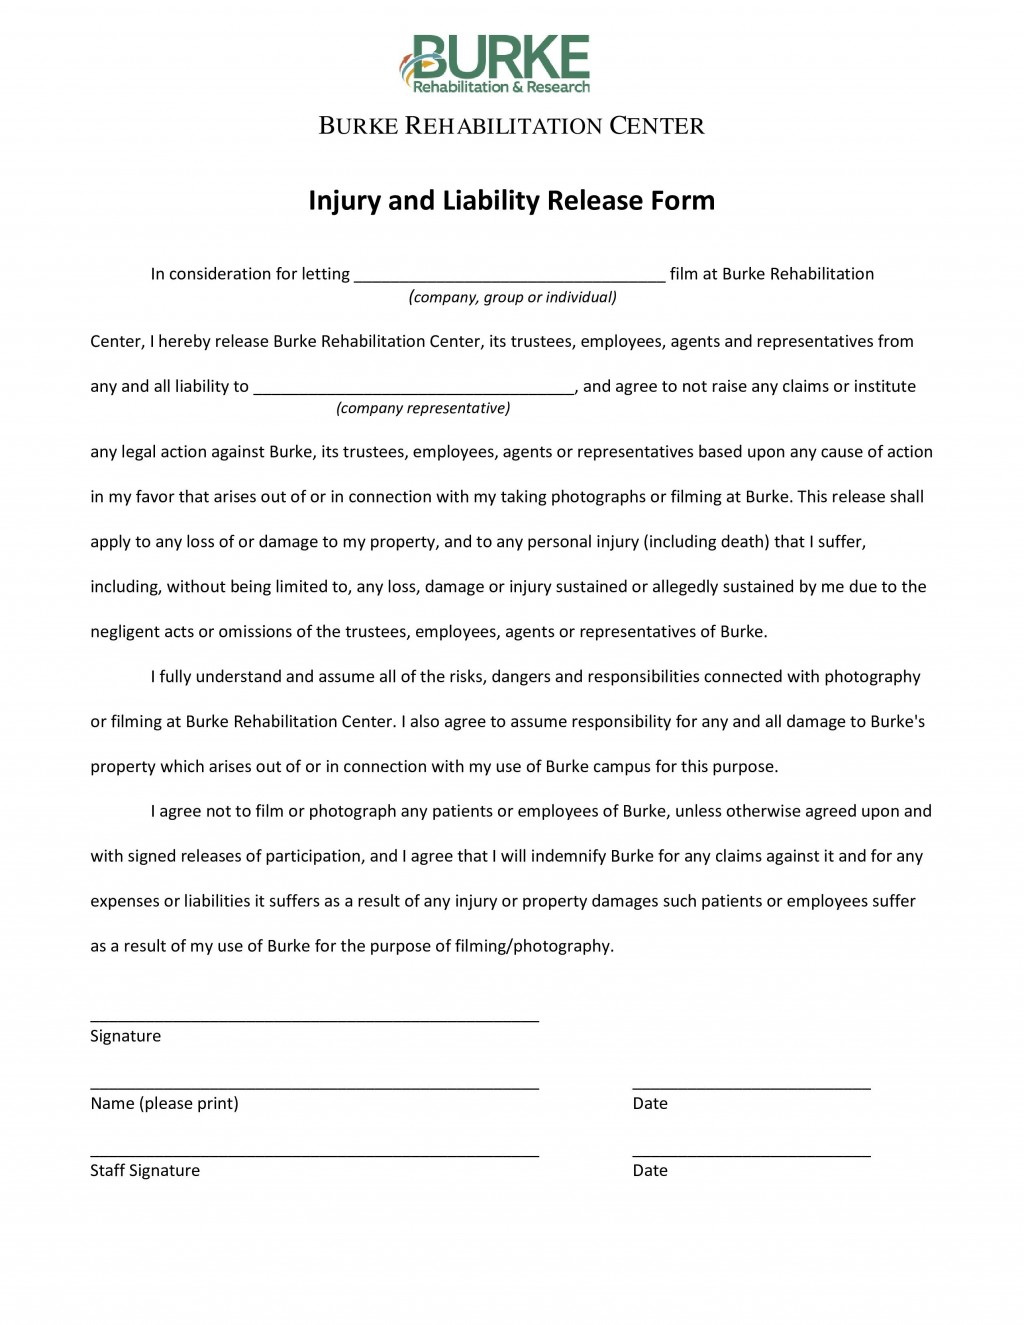 007 Breathtaking Liability Release Form Template Idea  Free GeneralLarge